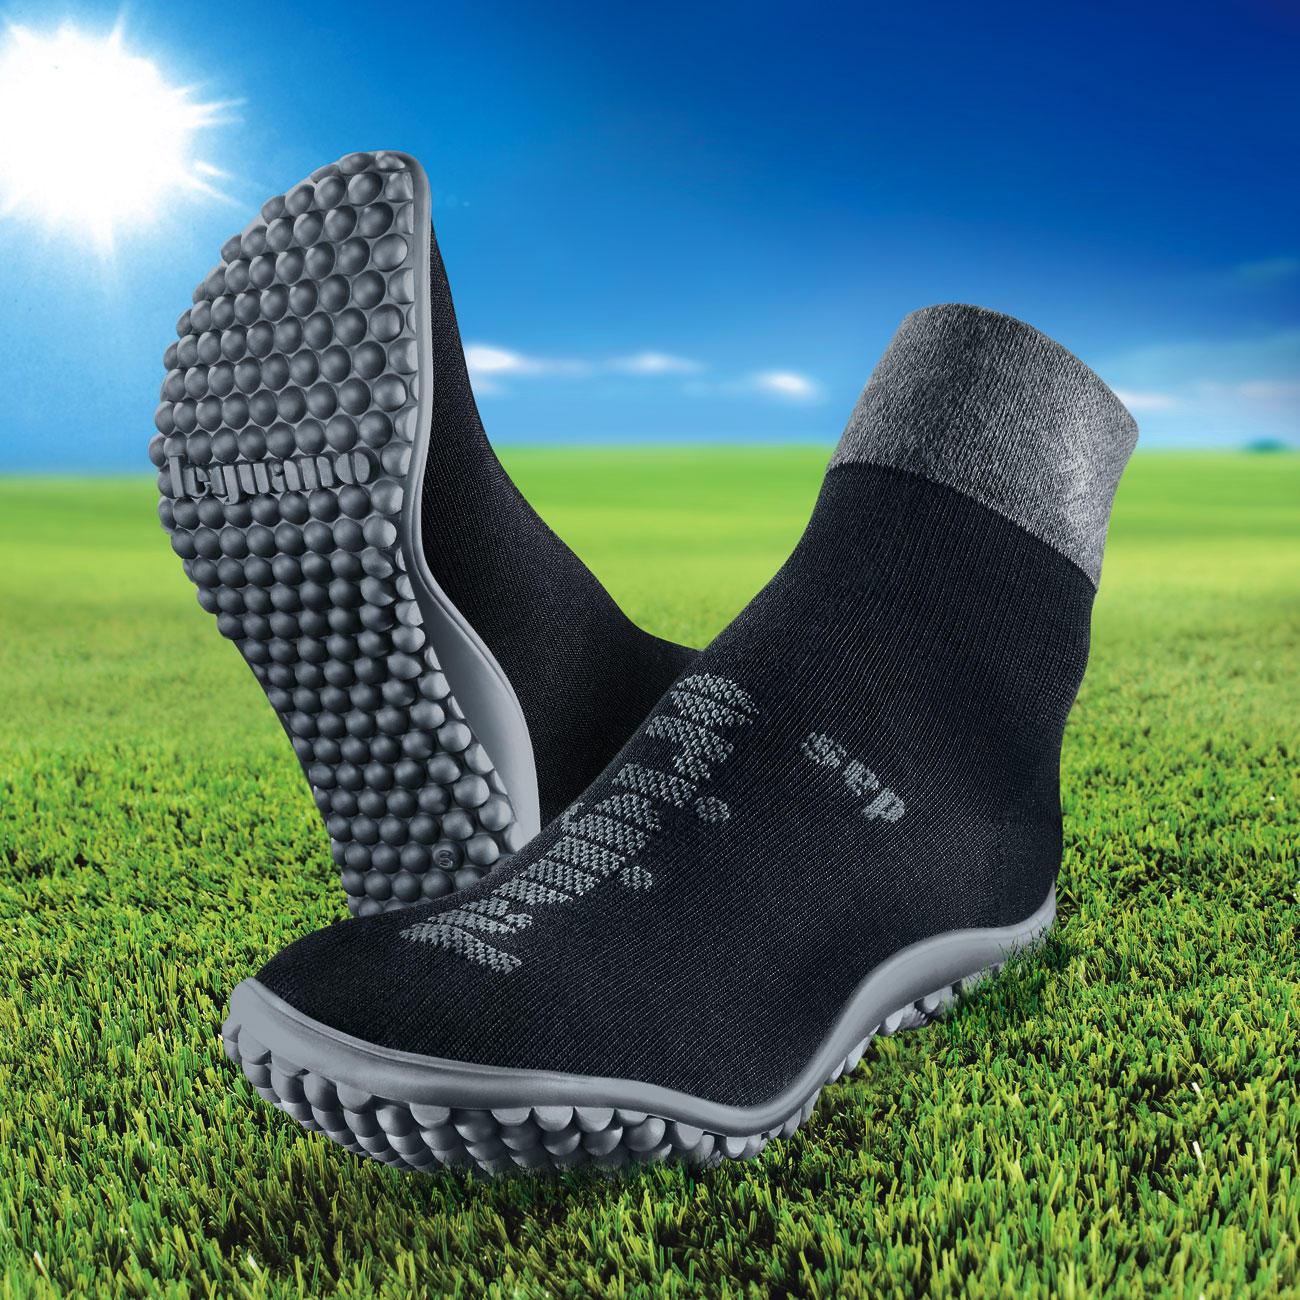 Buy Leguano 174 Barefoot Sock Or Ballerina Flats Online